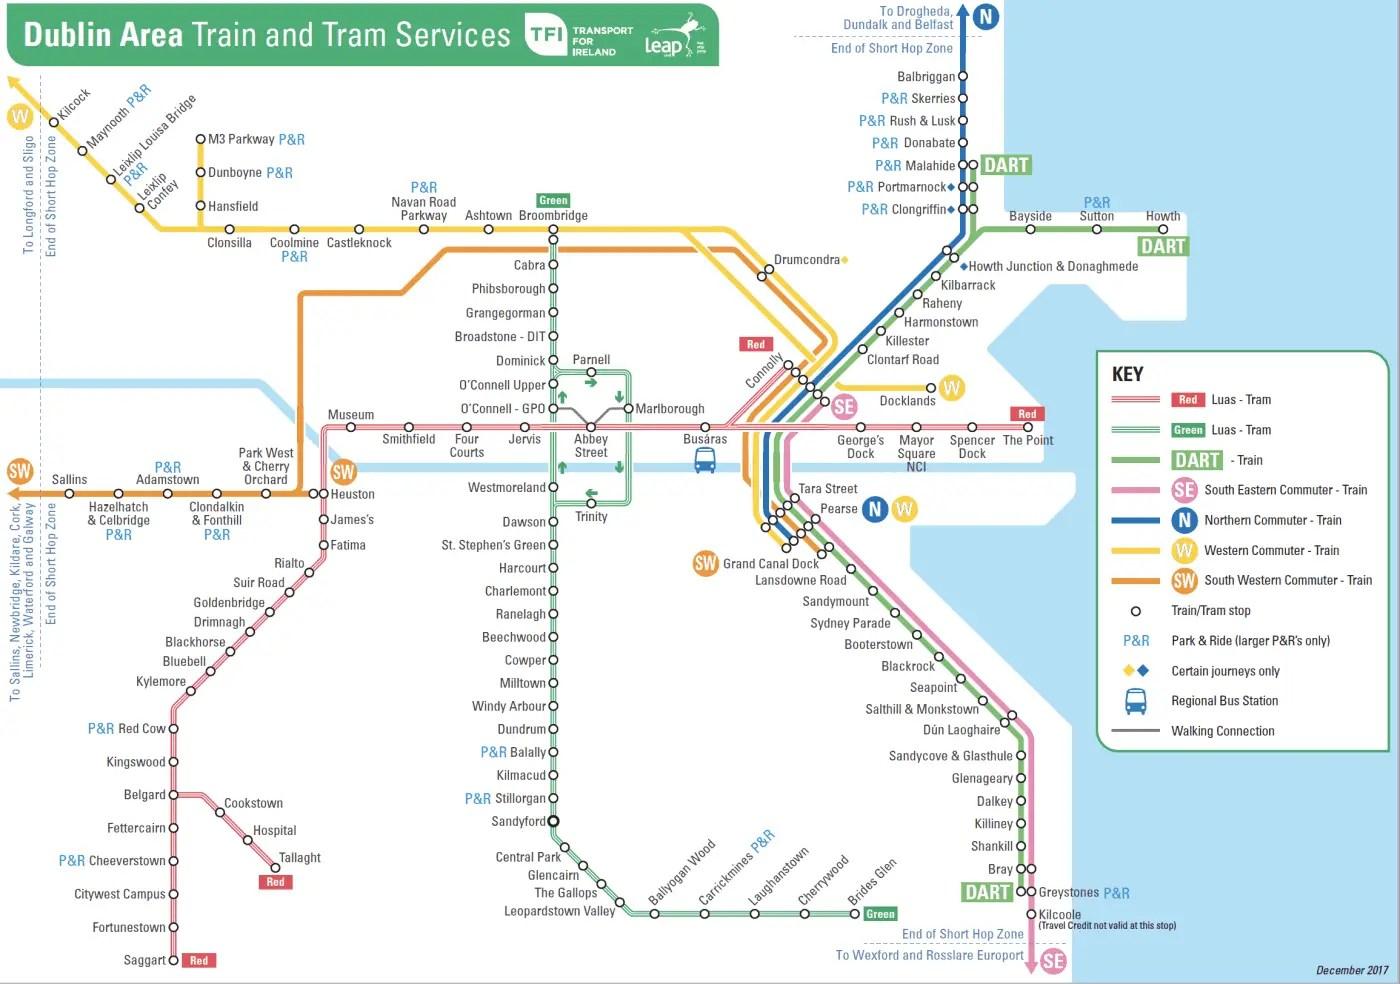 Dublin Area Transit Map